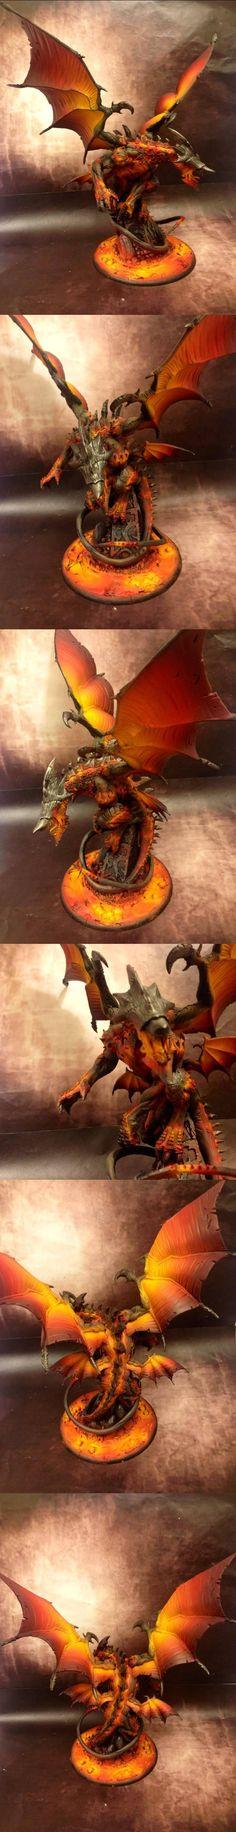 Archangel, Legion of Everblight gargantuan. It's so cool how they got the molten effect.